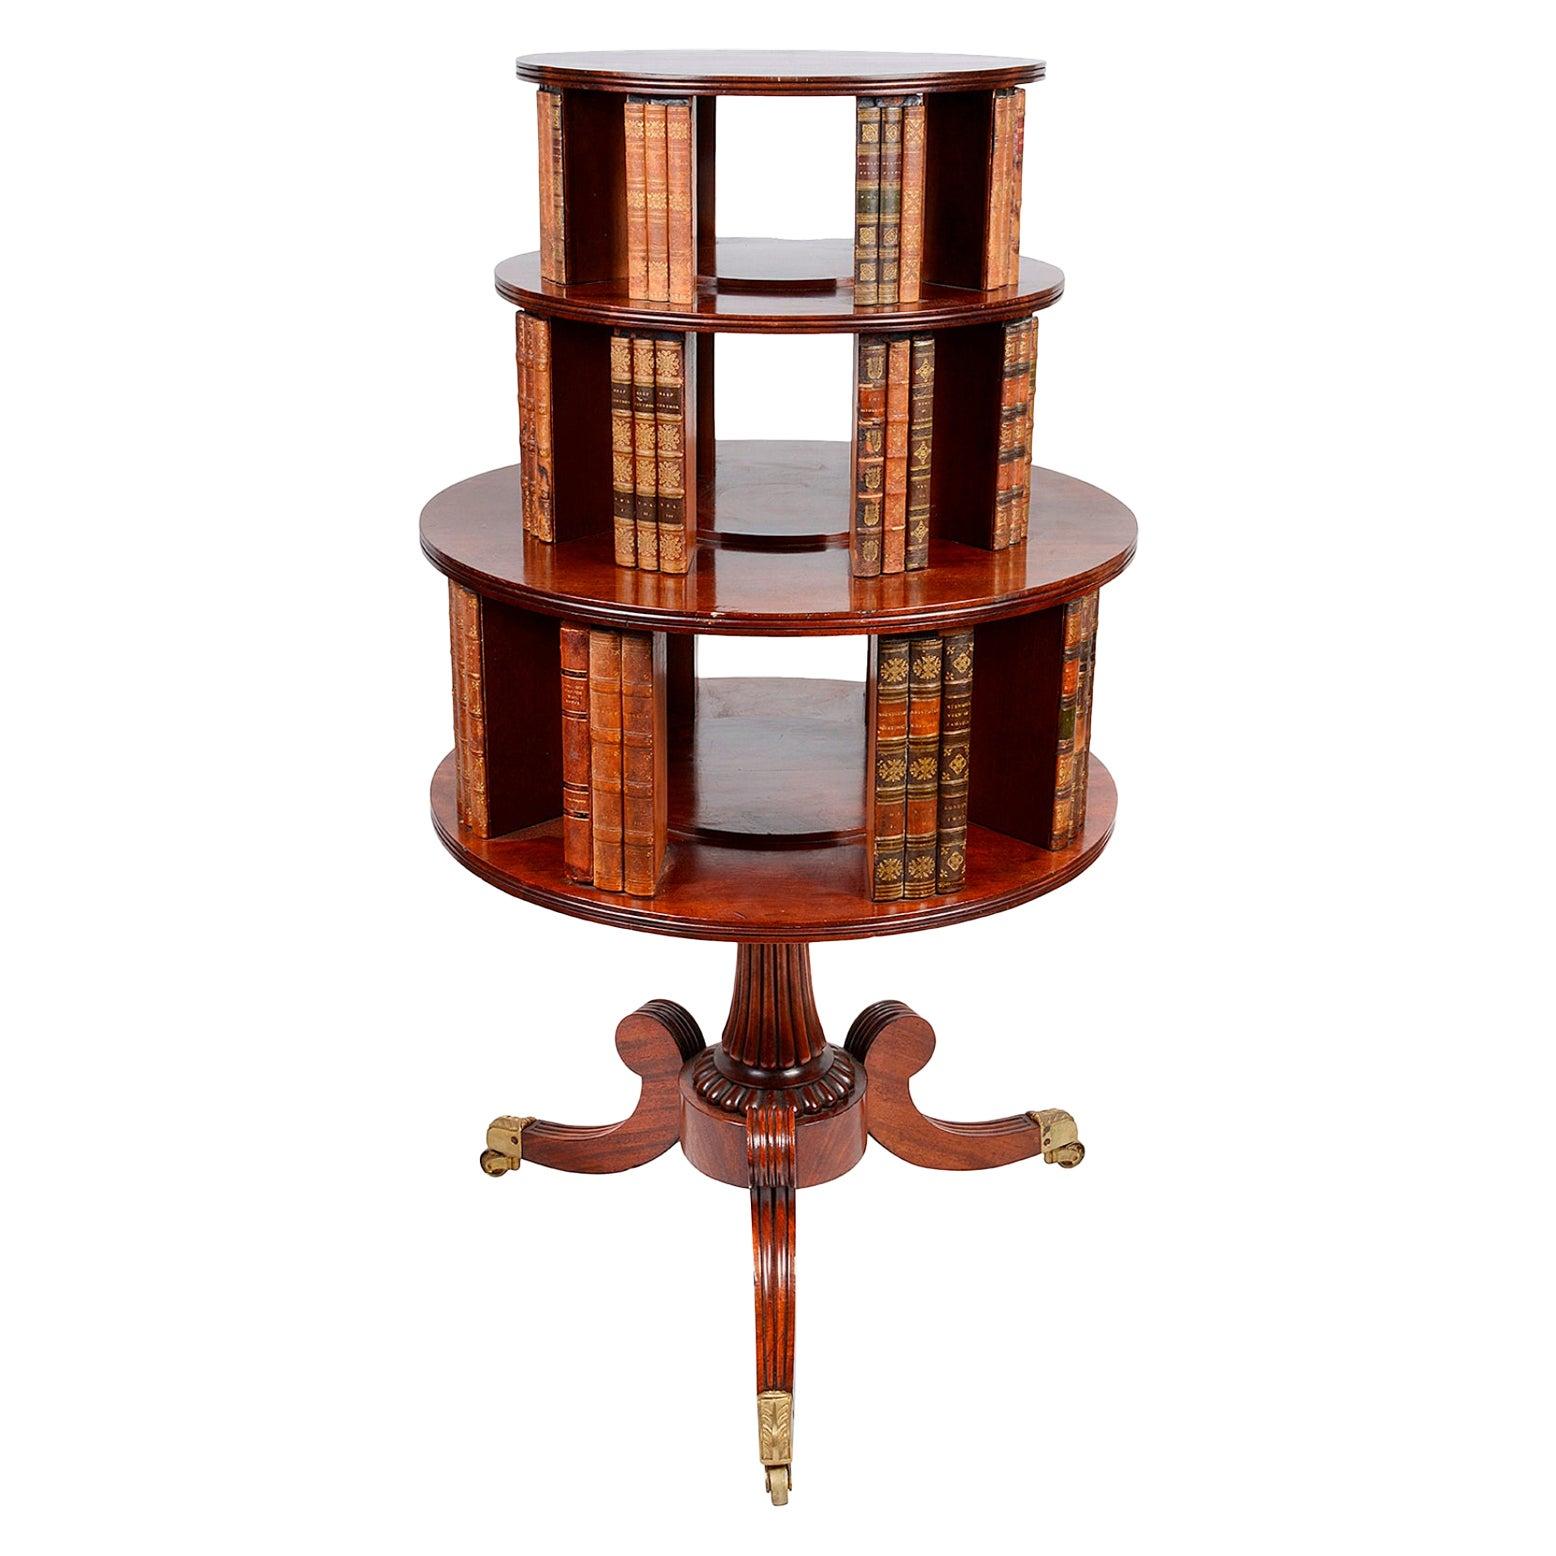 Regency Period Mahogany Revolving bookcase, circa 1820